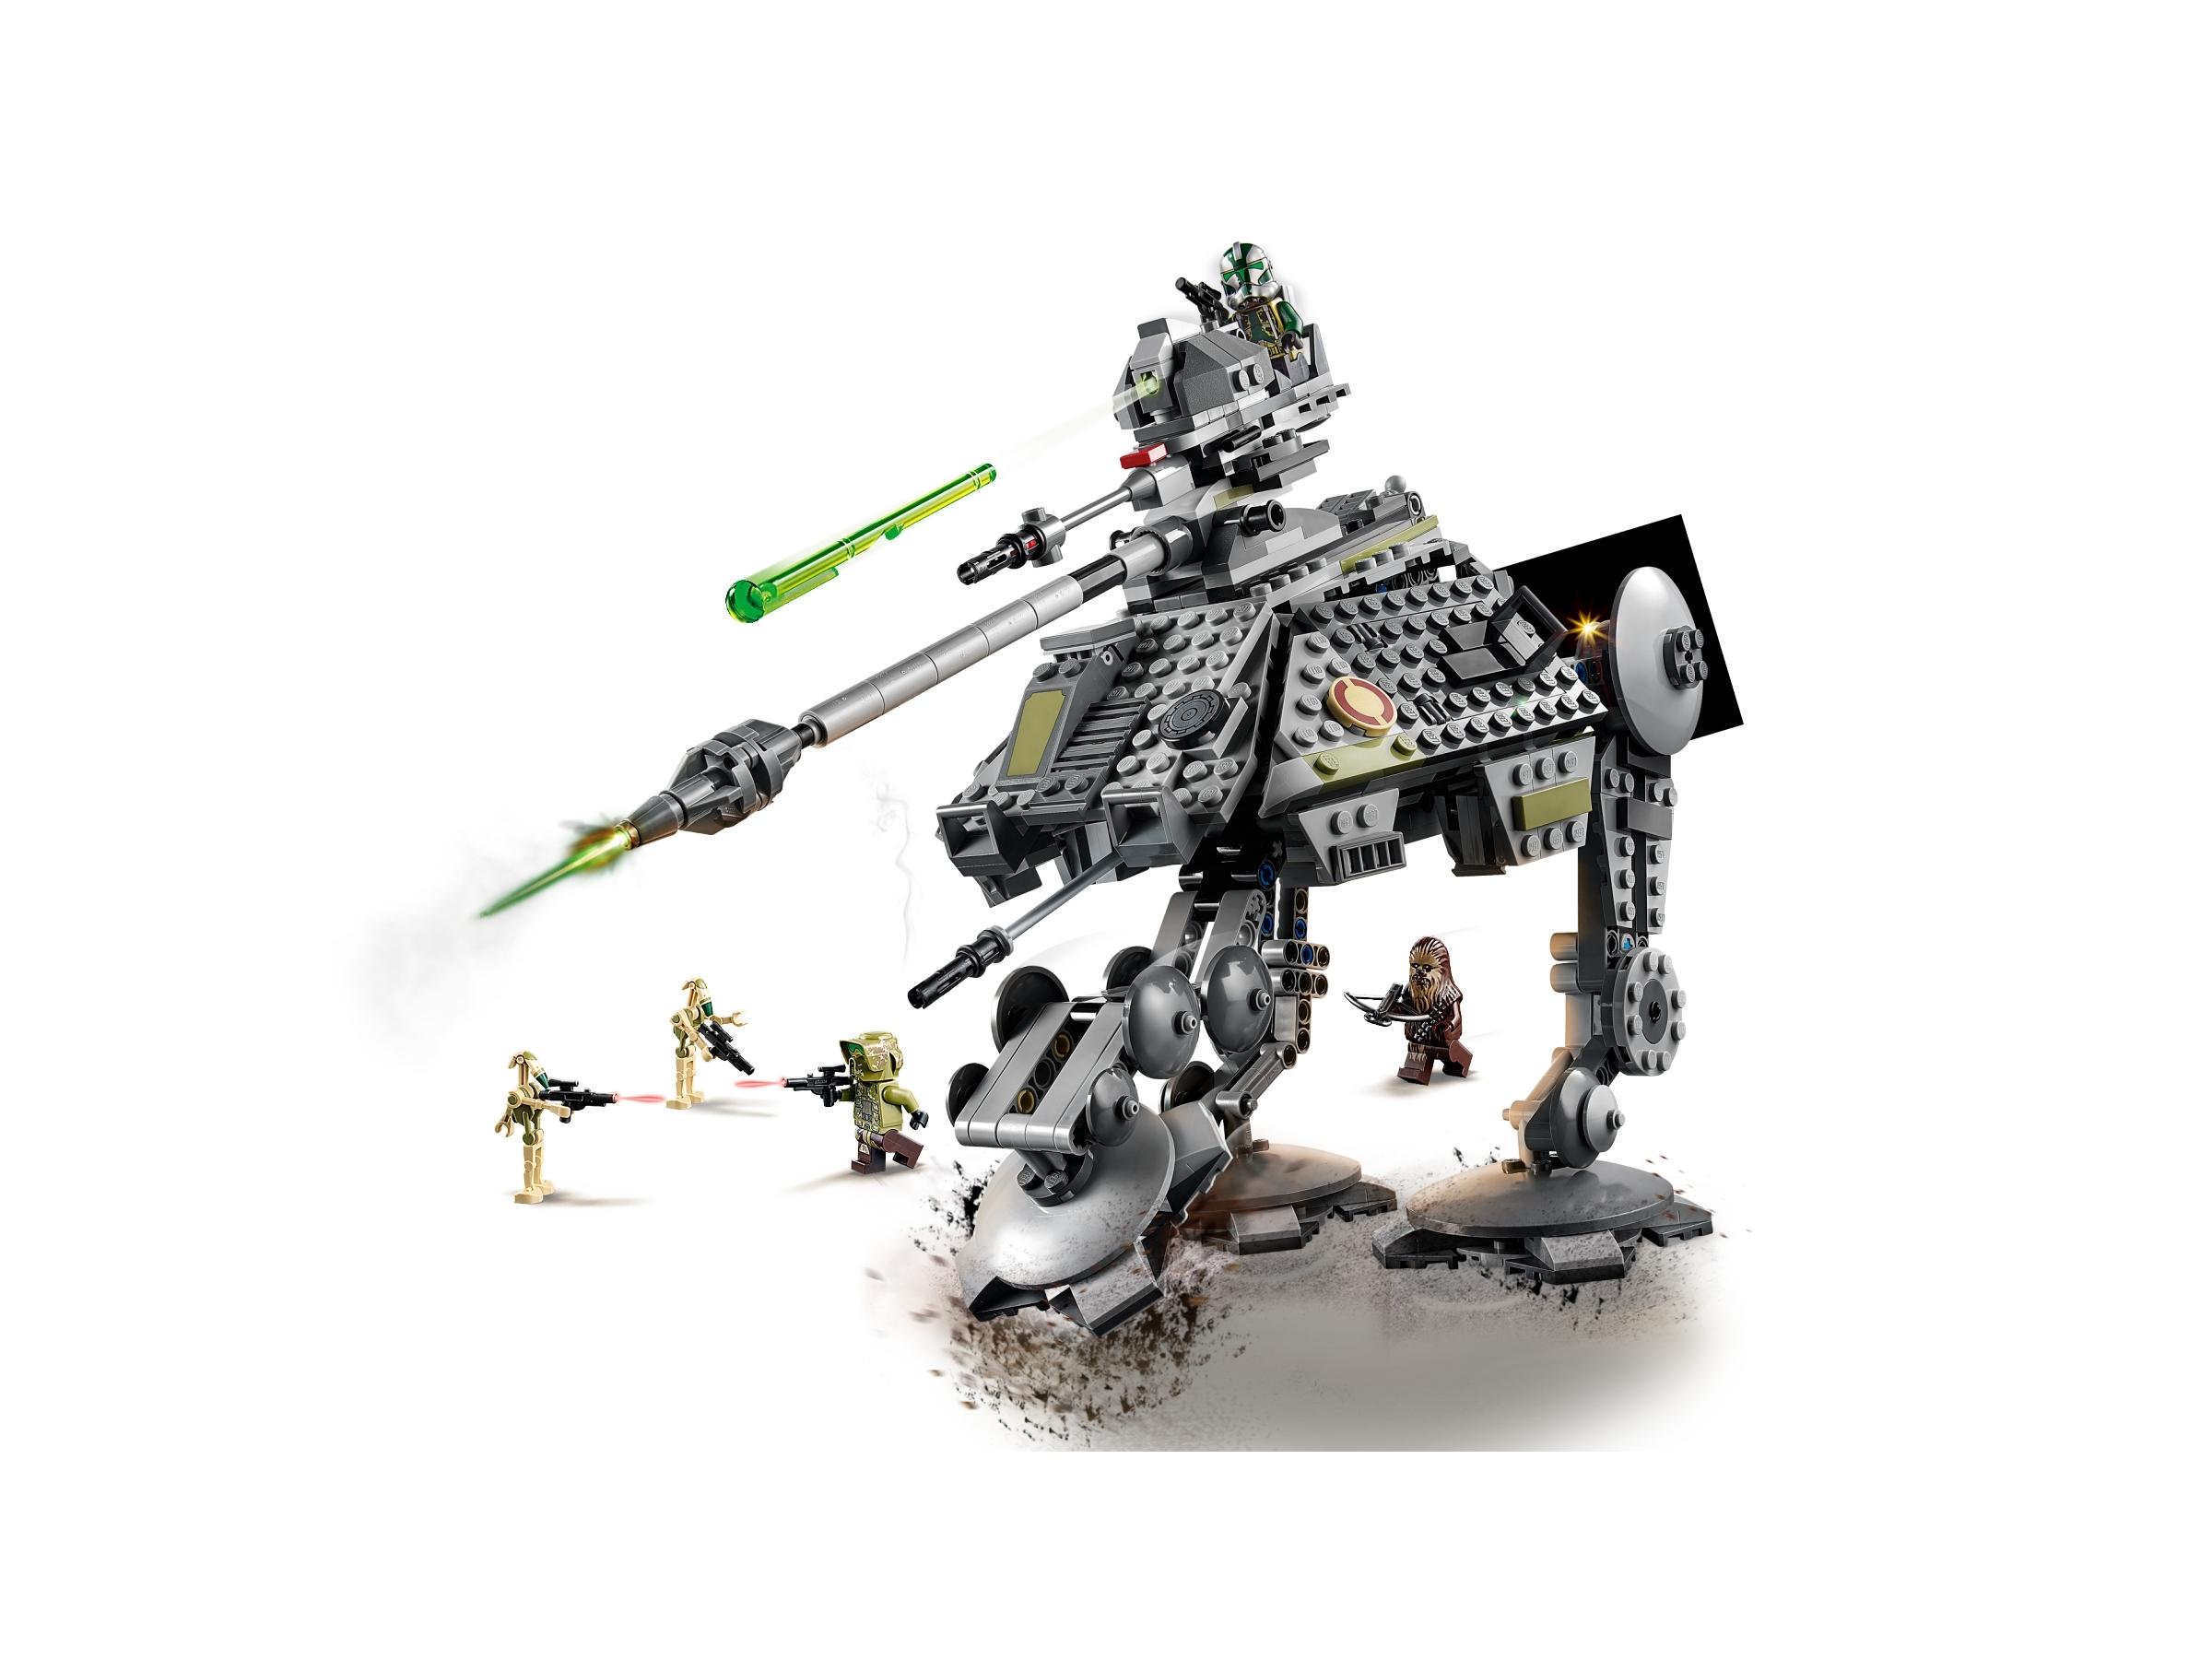 LEGO Star Wars Commander Gree Minifigure Blasters 75043 75234 Keychain Clone